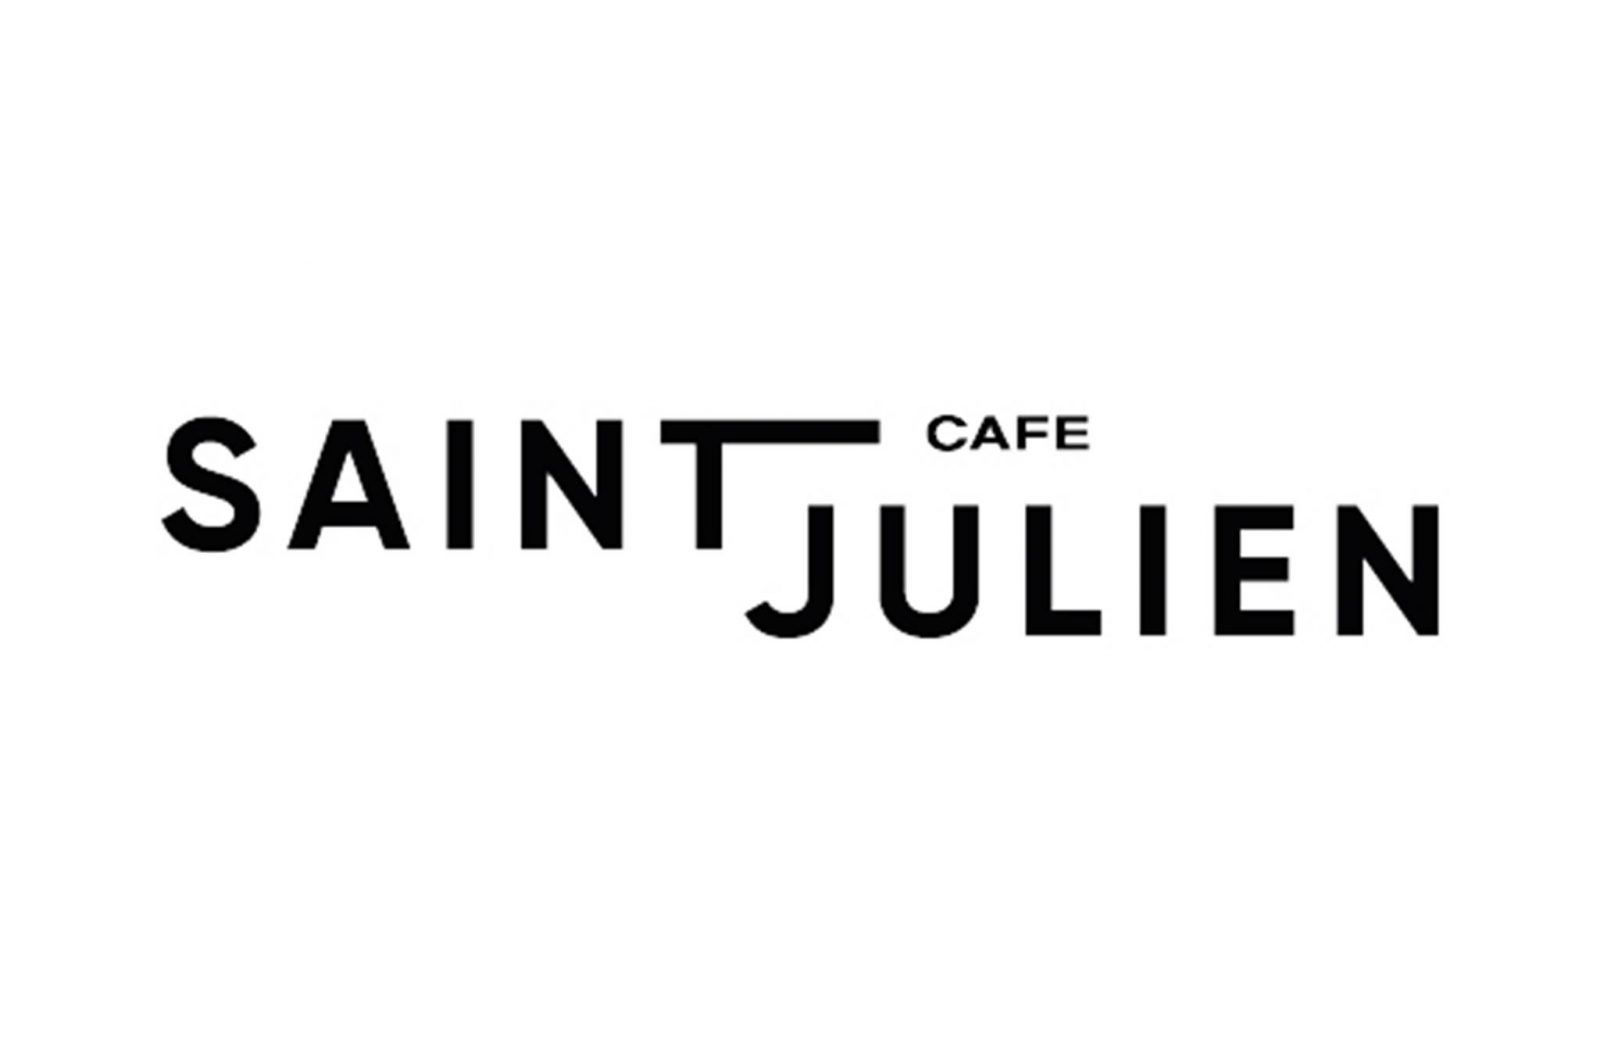 Café saint julien-Muzillac-DLRBT